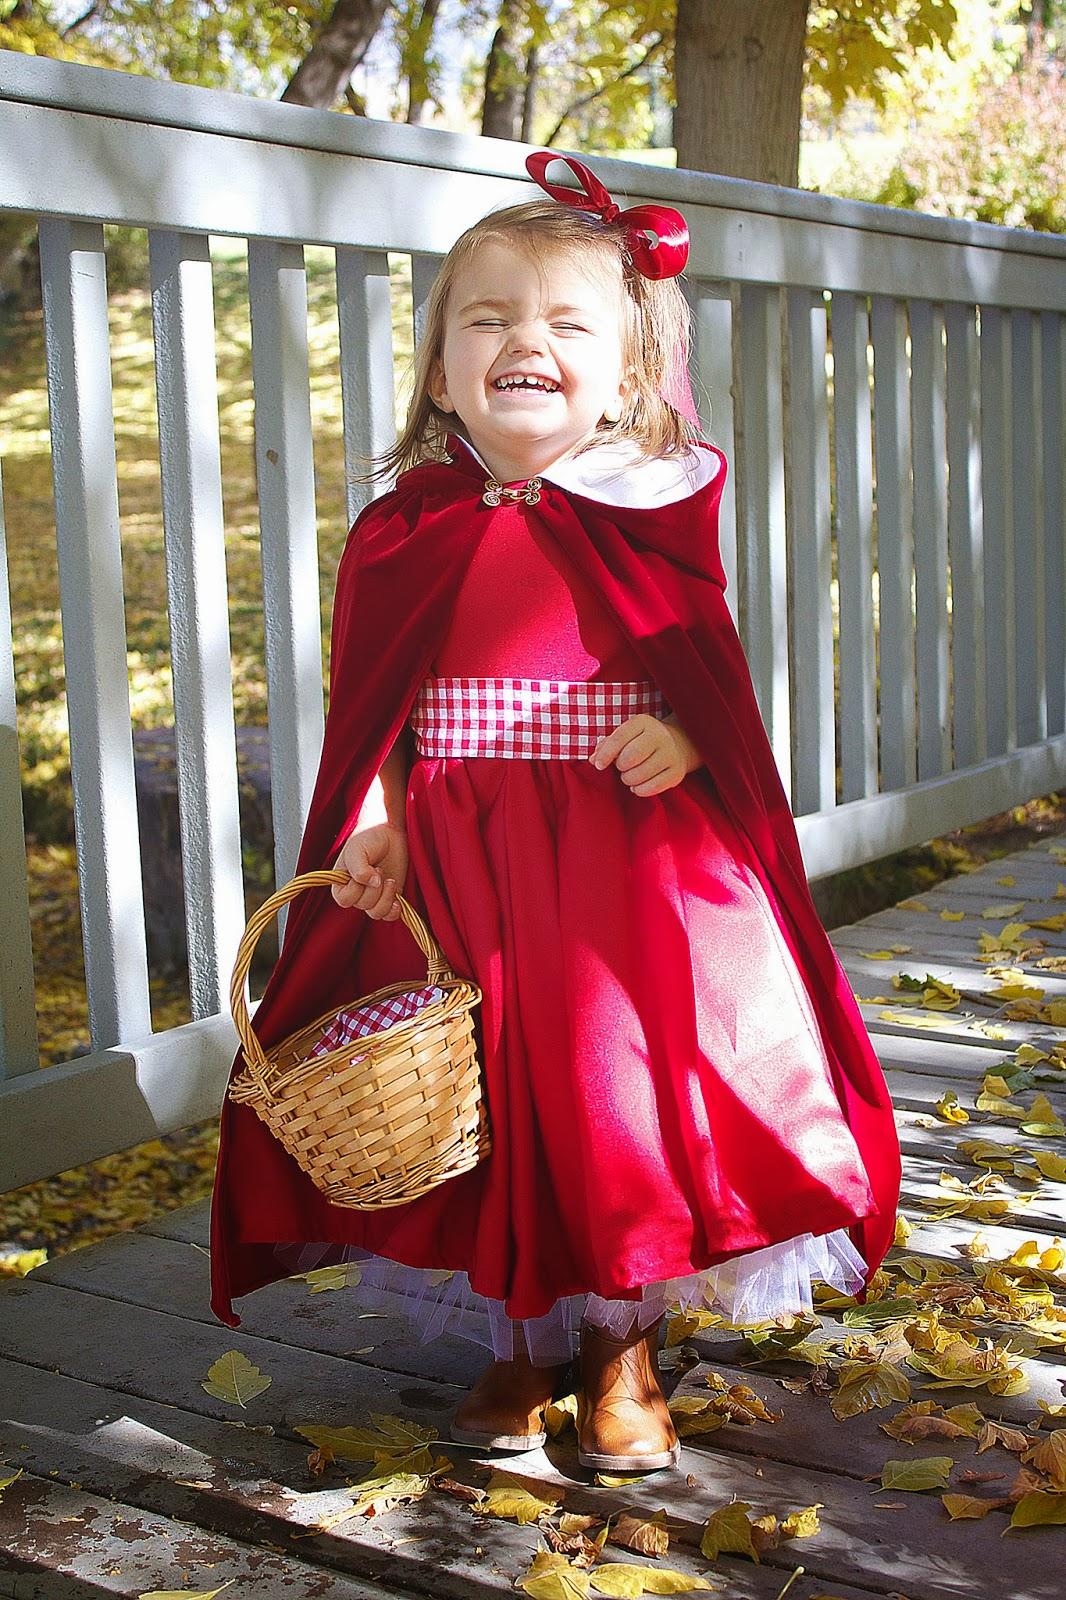 Do it yourself divas diy little red riding hood costumecloak 2t 4t diy little red riding hood costumecloak 2t 4t solutioingenieria Images